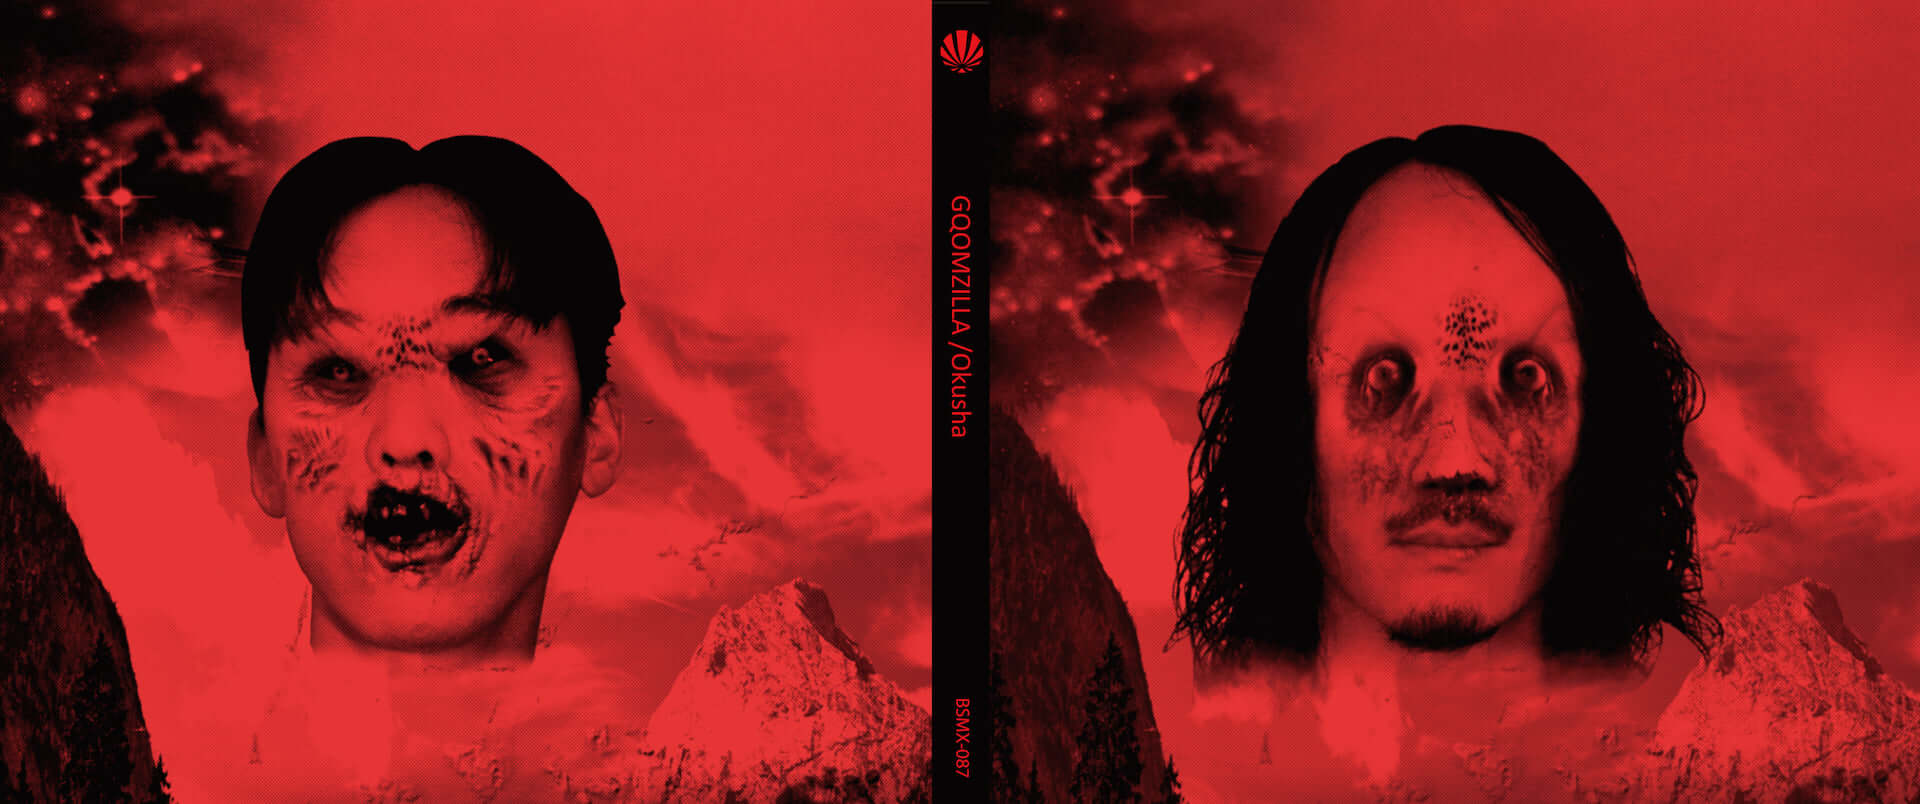 KΣITOとDJ MOROのユニット・GQOMZILLAの新MIX CD『Okusha』が〈BLACK SMOKER RECORDS〉から発売決定|mitokonによるライナーノーツも公開 music200622_gqomzilla_1-1920x804